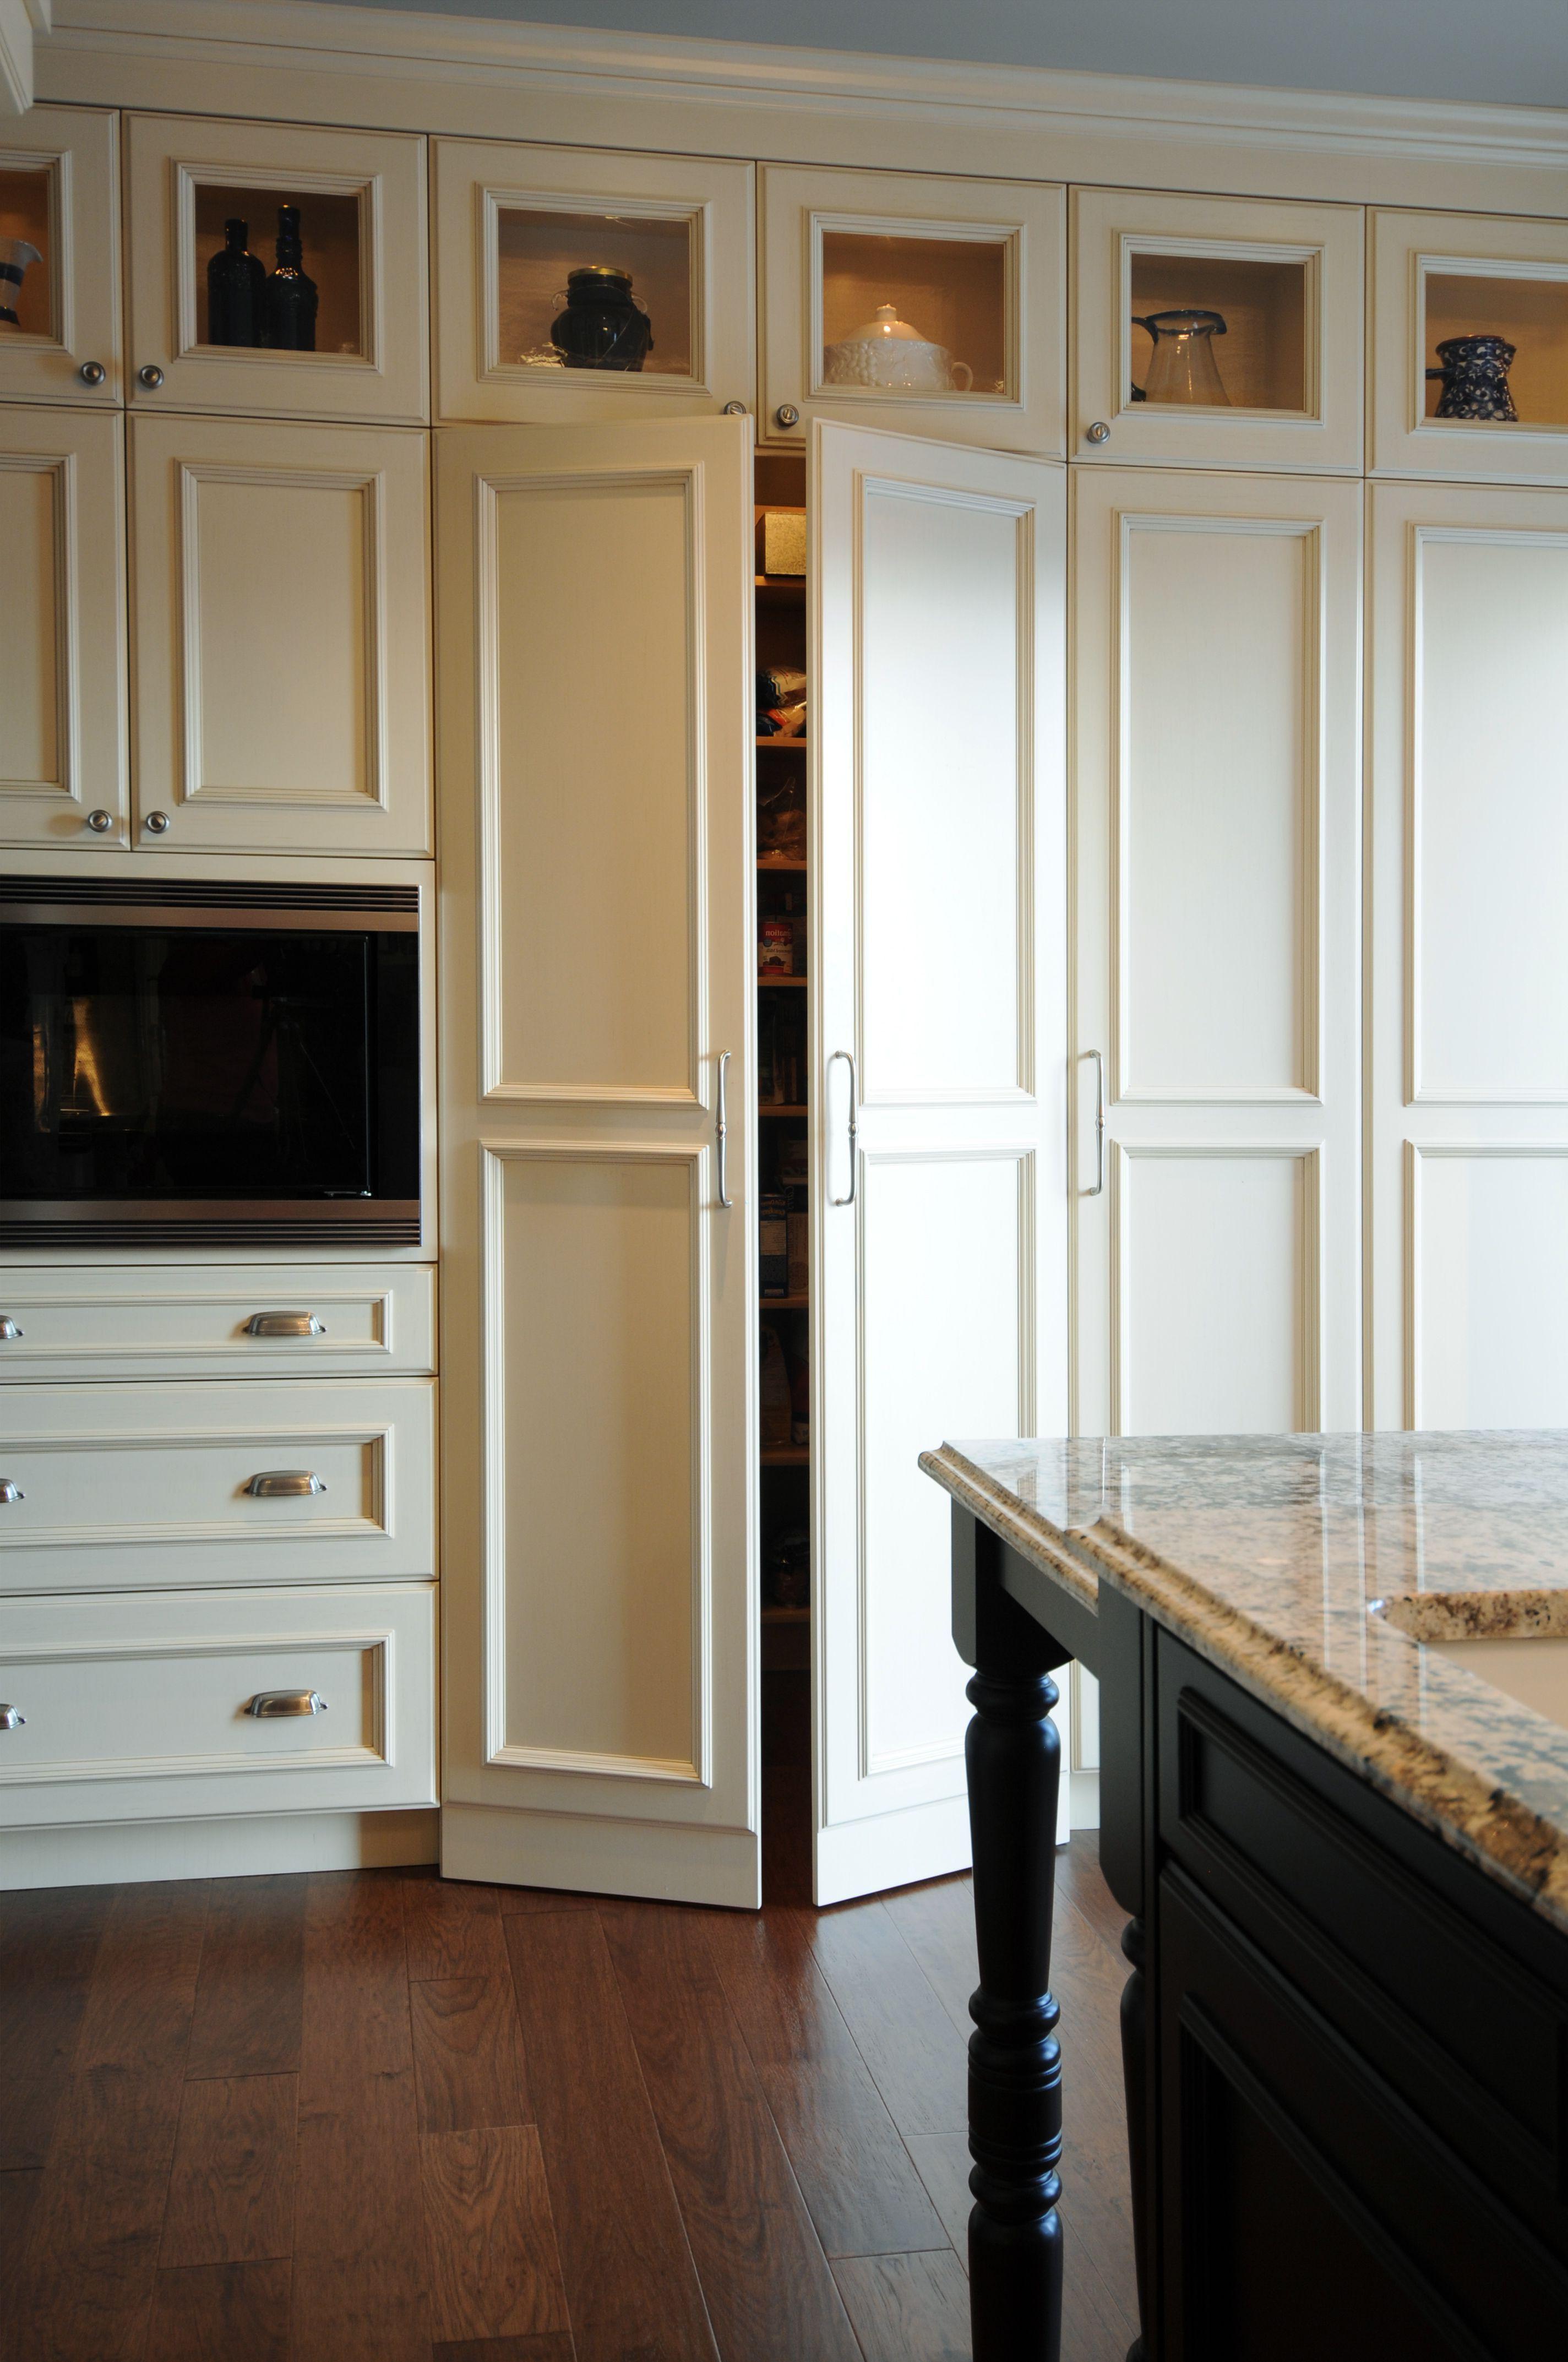 Habitat Restore Or Craigslist For Used Cabinets To Paint Habitat Restore Habitat For Humanity Kitchen Cabinets